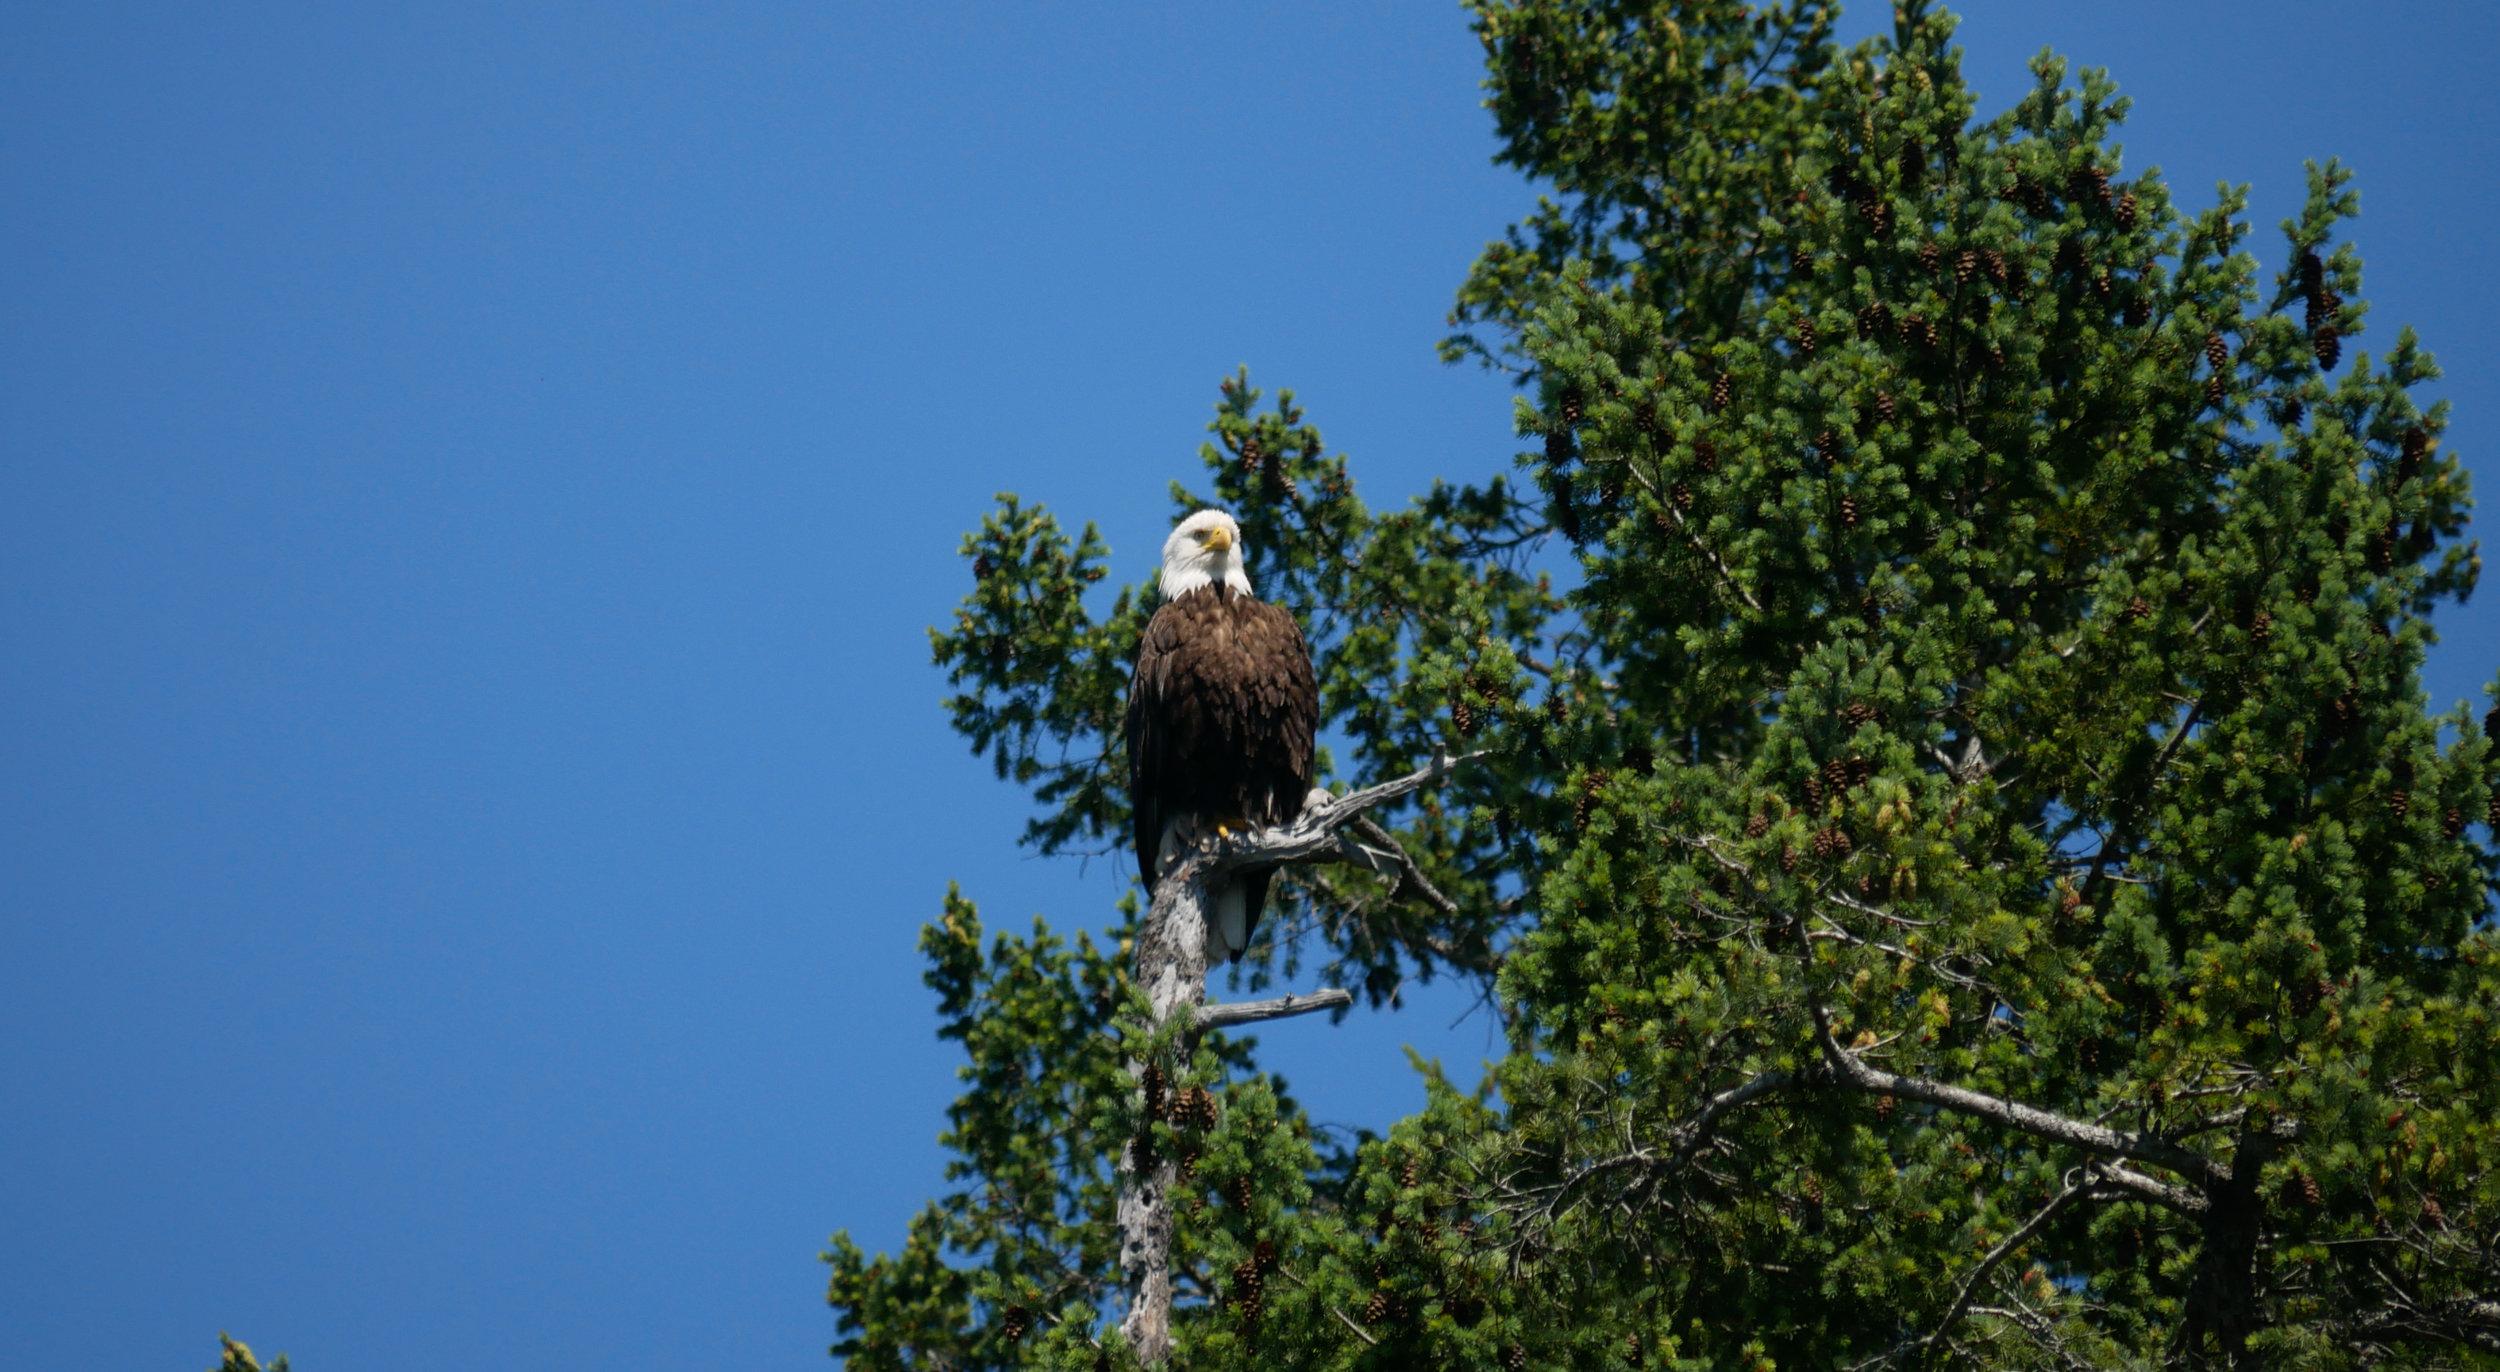 Bald Eagle. Photo by Cheyenne Brewster.